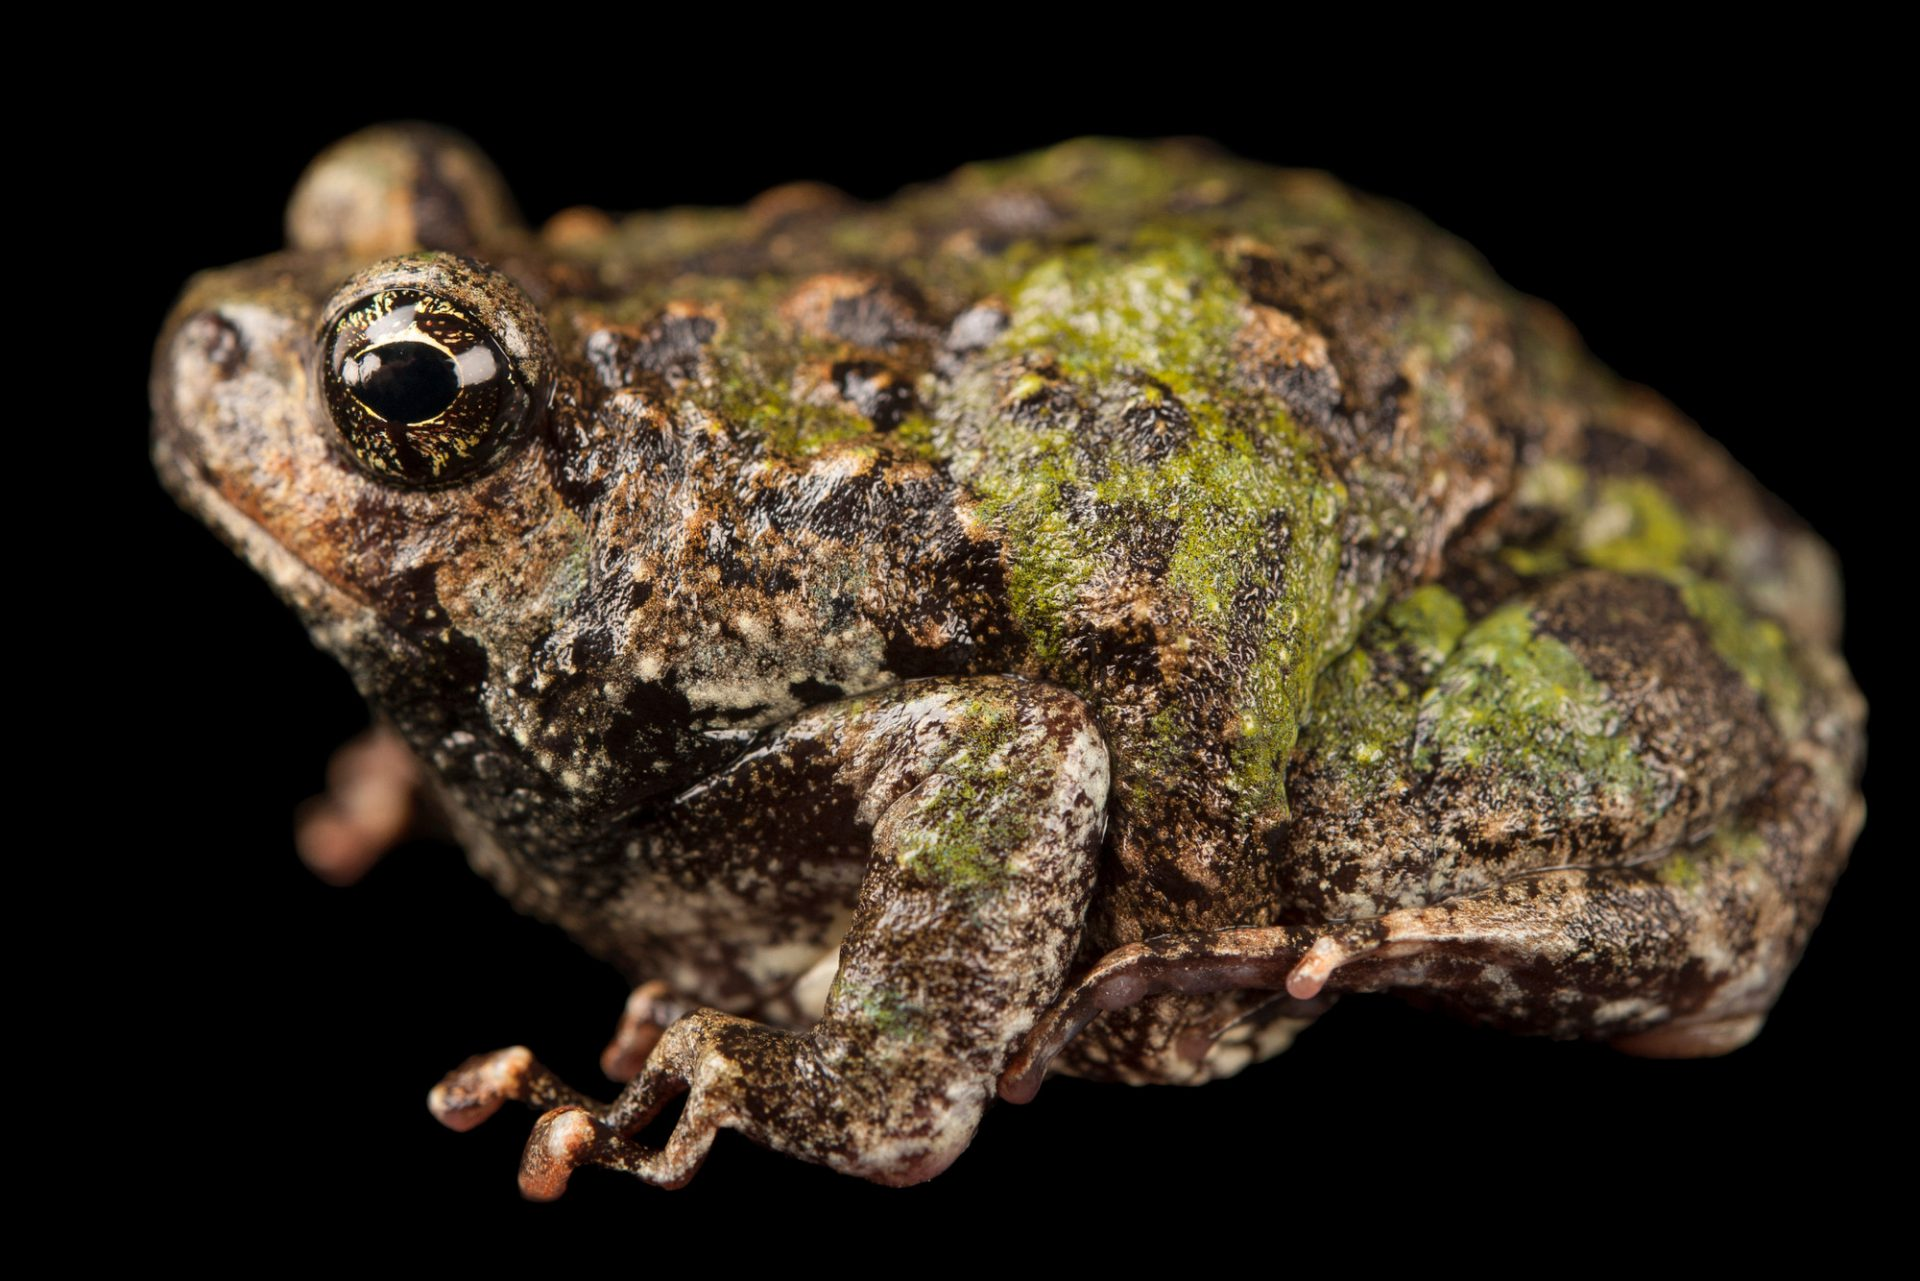 A Madagascar rain frog (Scaphiophryne madagascariensis) at the Omaha Zoo.